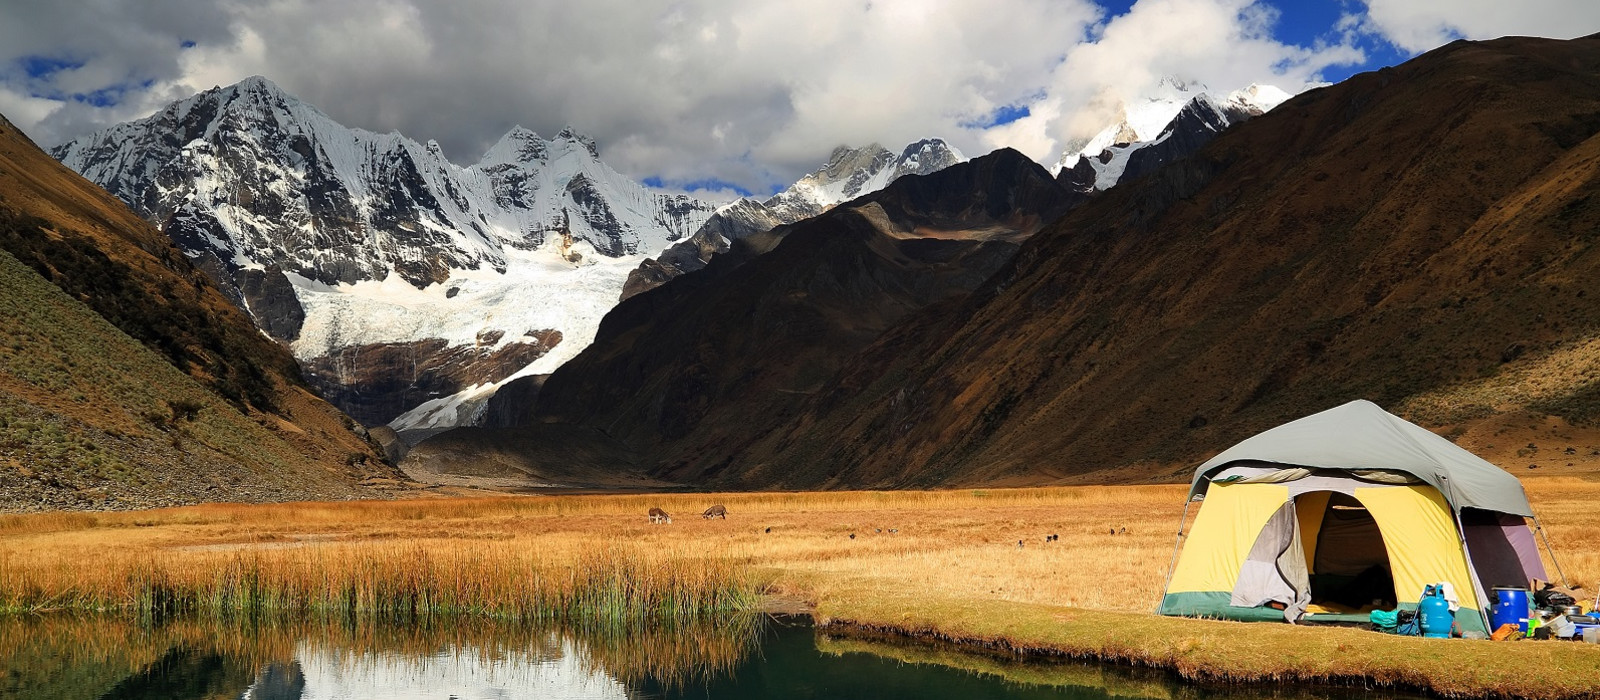 Peru Wanderreise: Inca-Pfad & Cordillera Blanca Urlaub 1